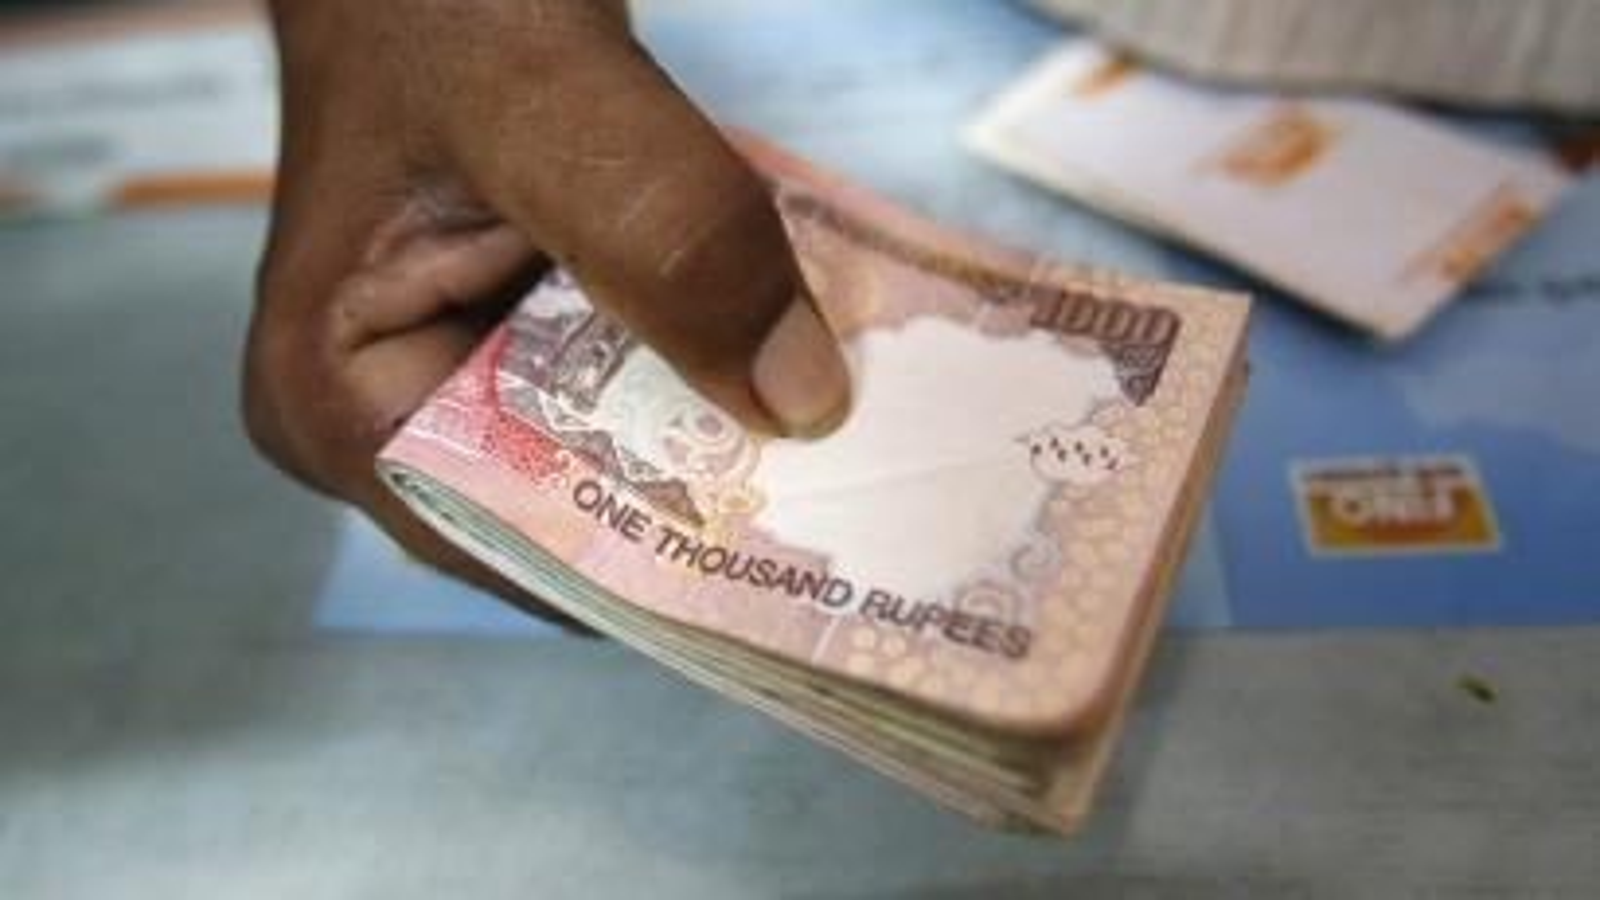 Rupee 500 1000 notes Modi